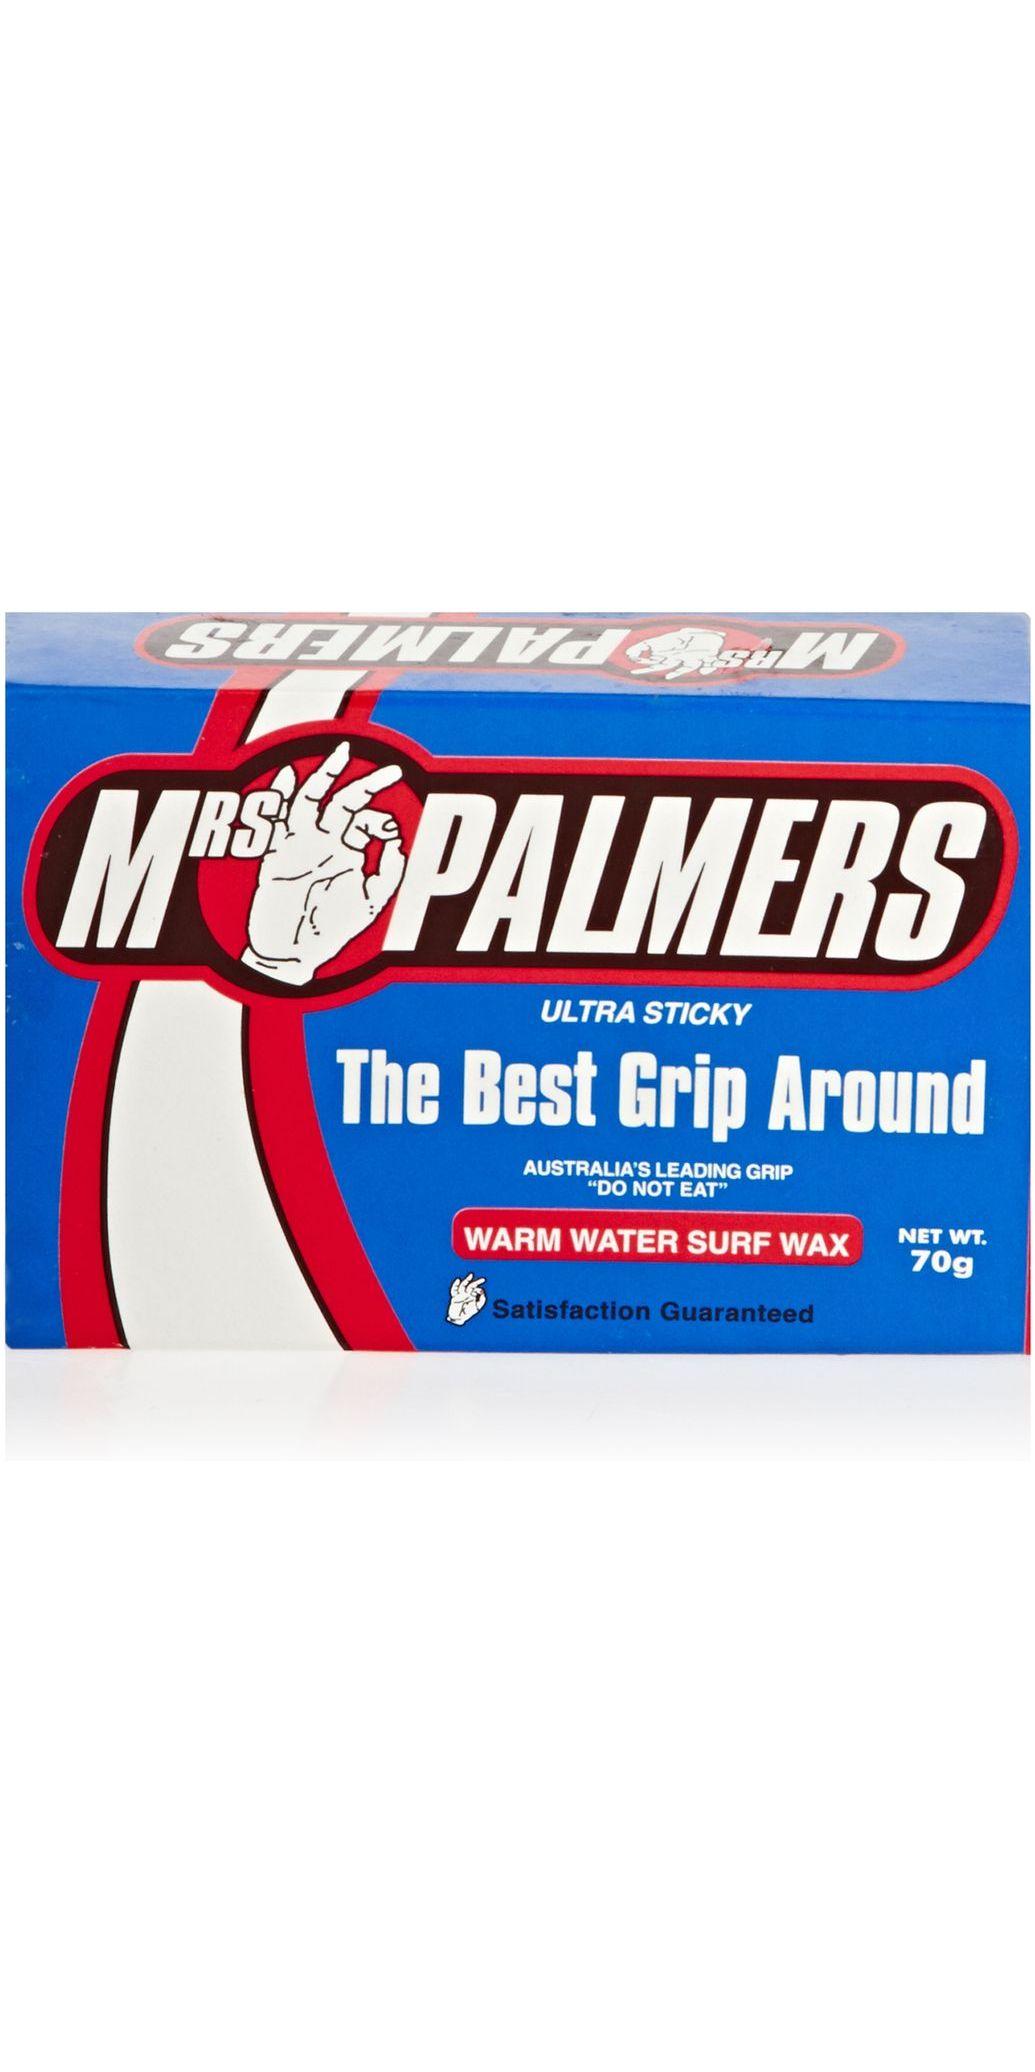 Mrs Palmers Warm Water Surf Wax